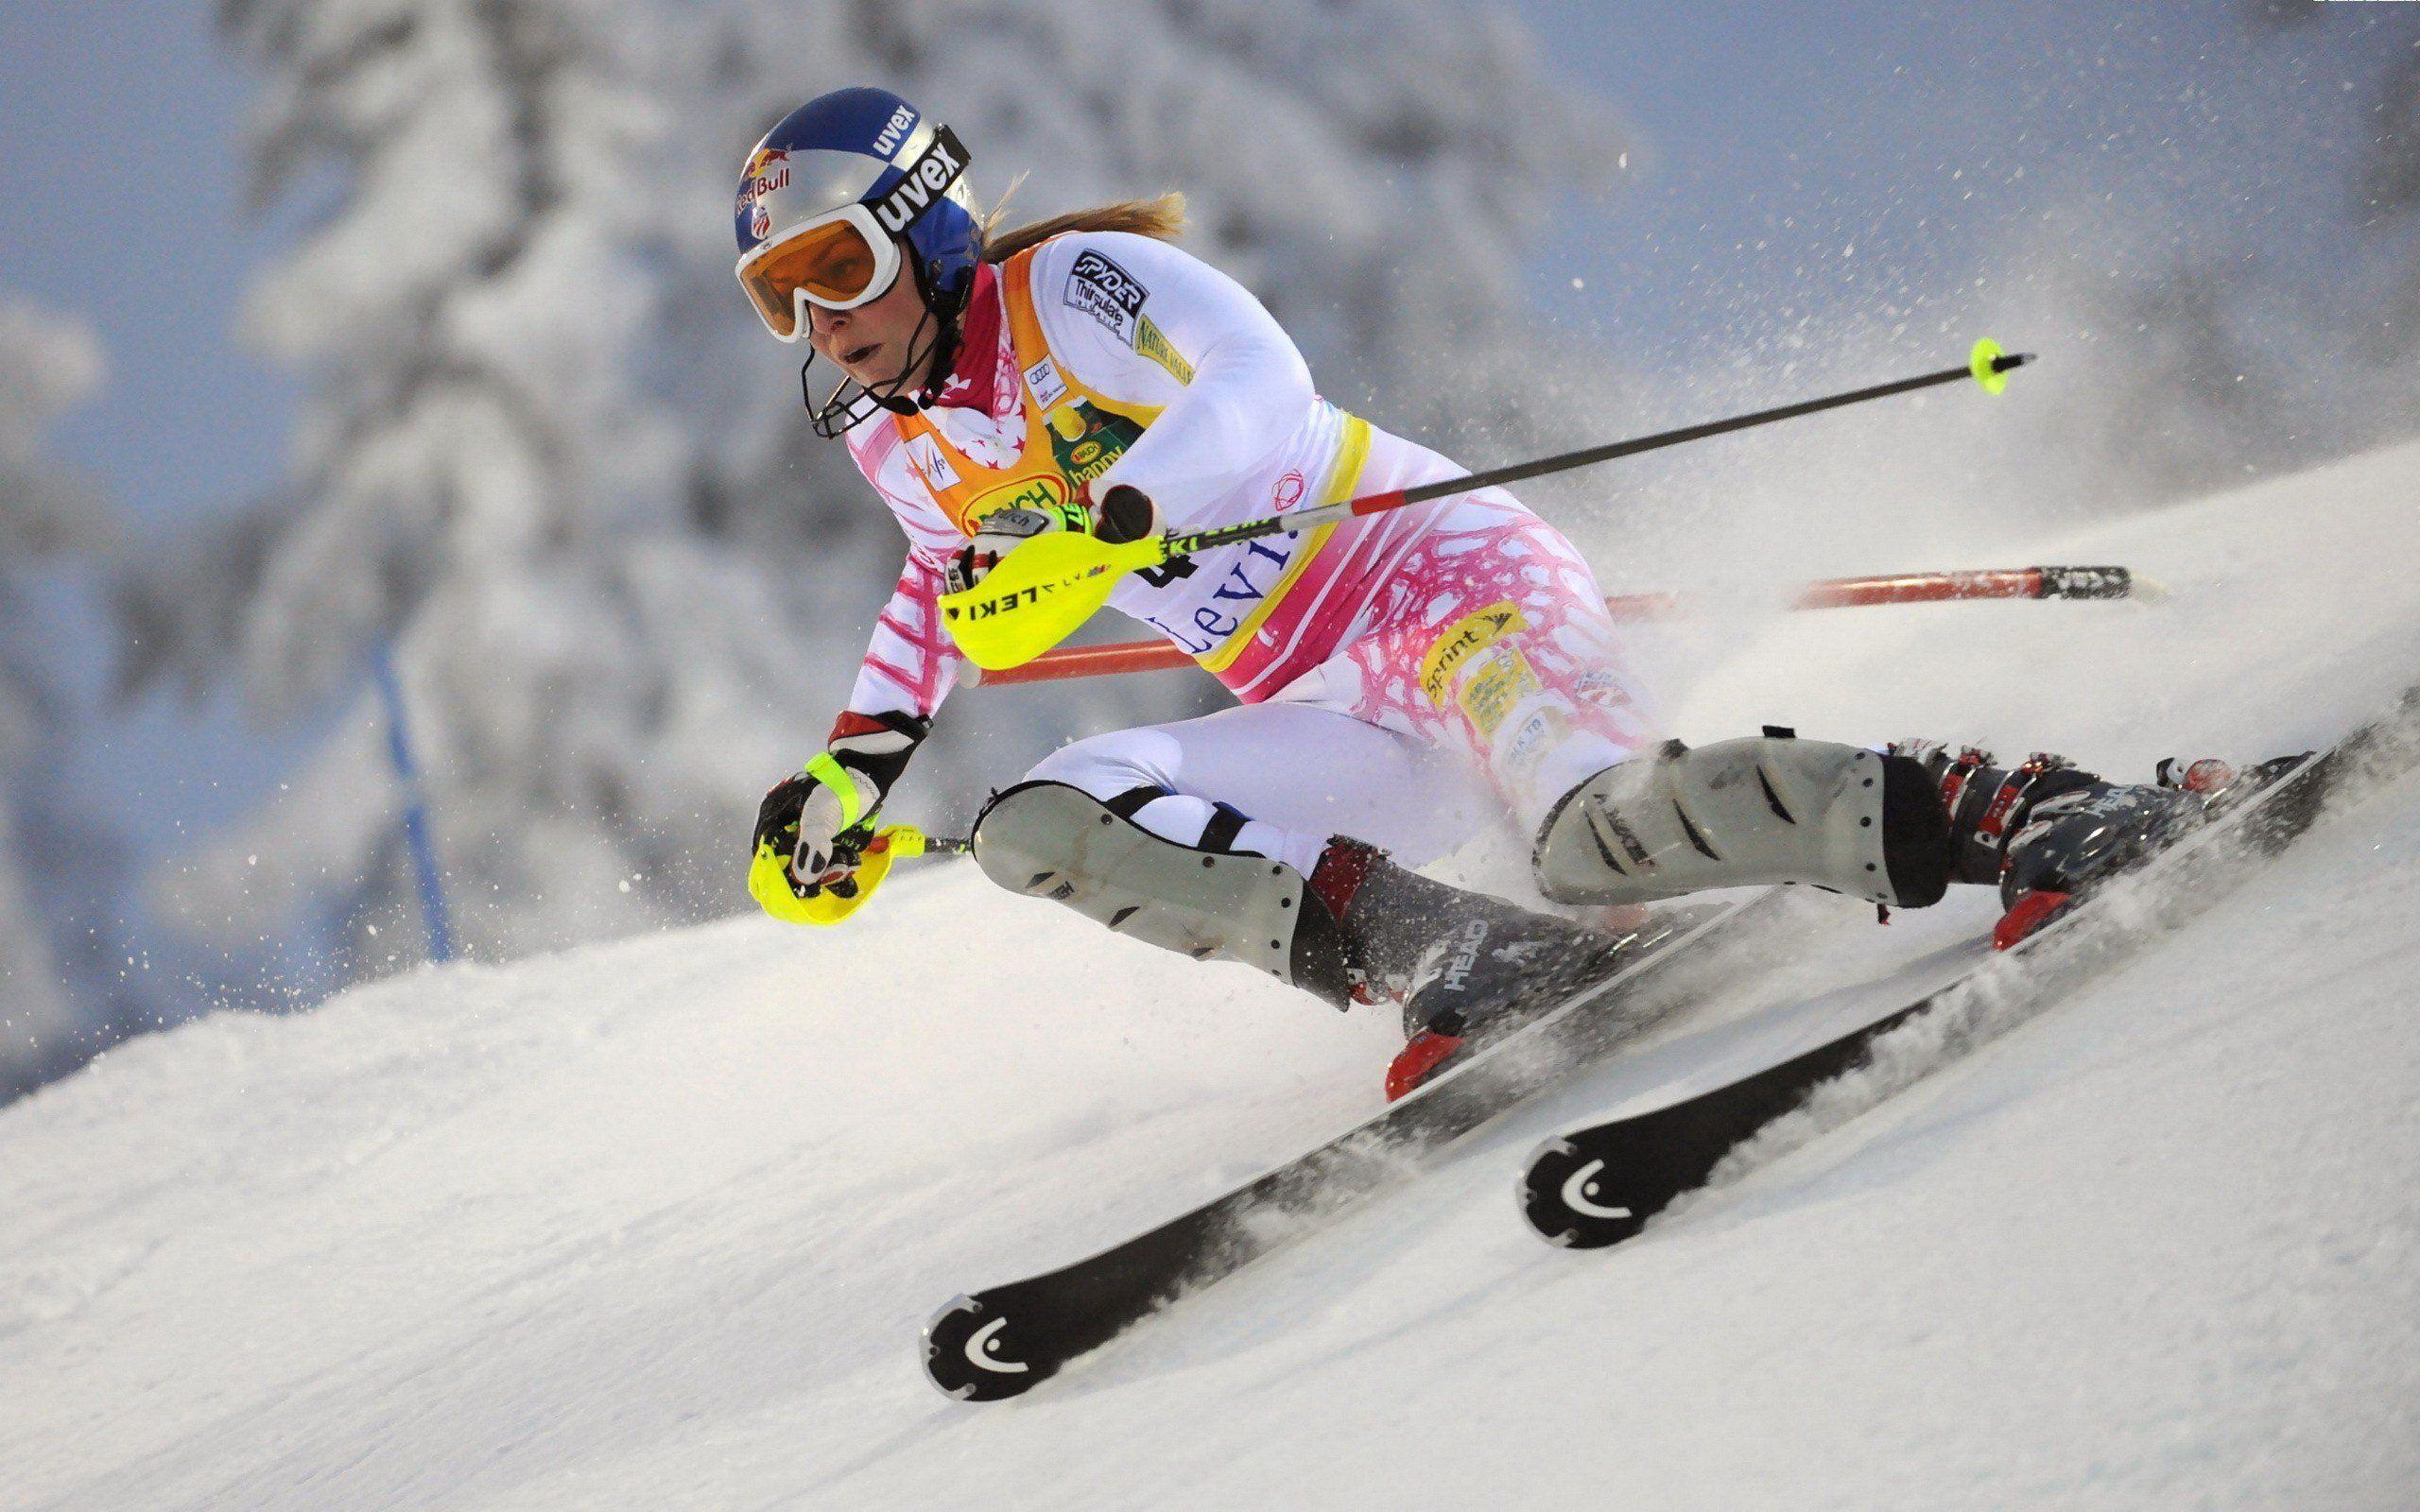 Skiing ski wallpaper 2560x1600 128423 wallpaperup - Ski wallpaper ...